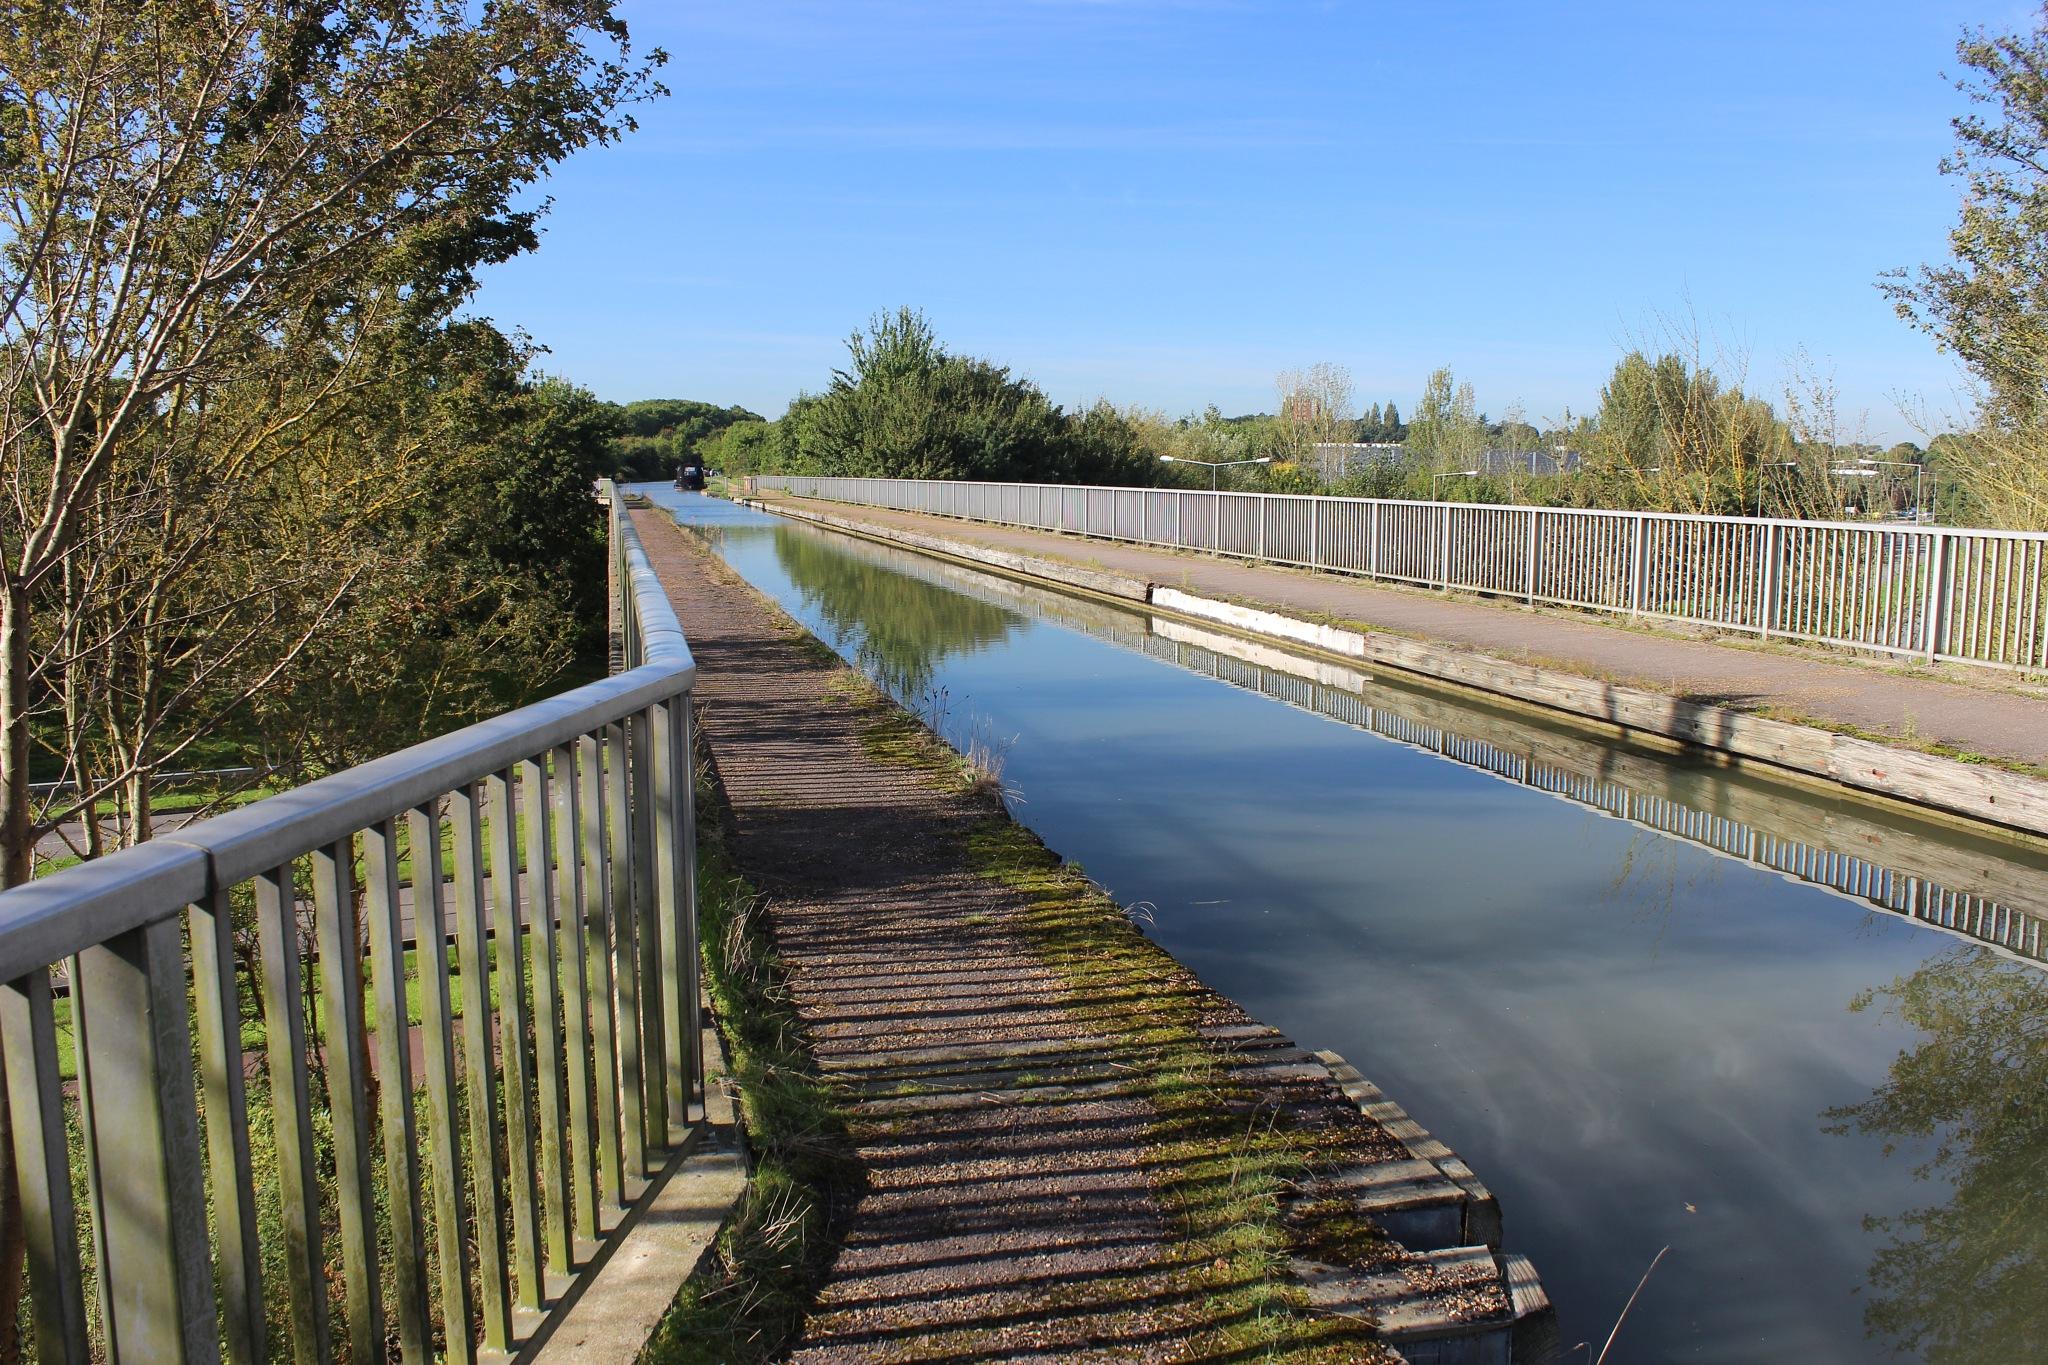 Modern Aqueduct (1) by Jon Brooke-Langham